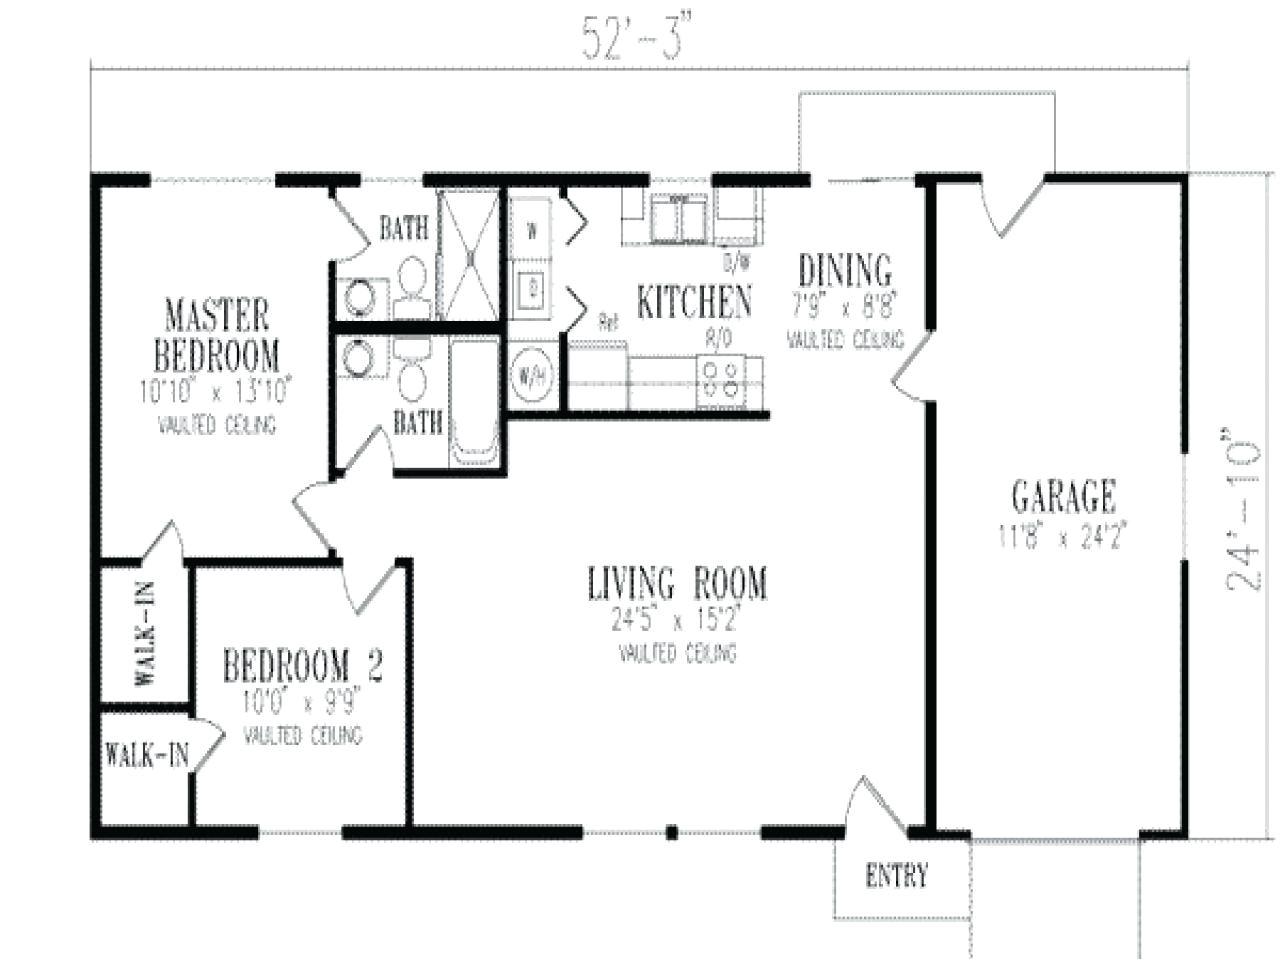 1000 square foot house plans 500 lrg a67890b285ed7aaa 1200 8f100787a7d7e338